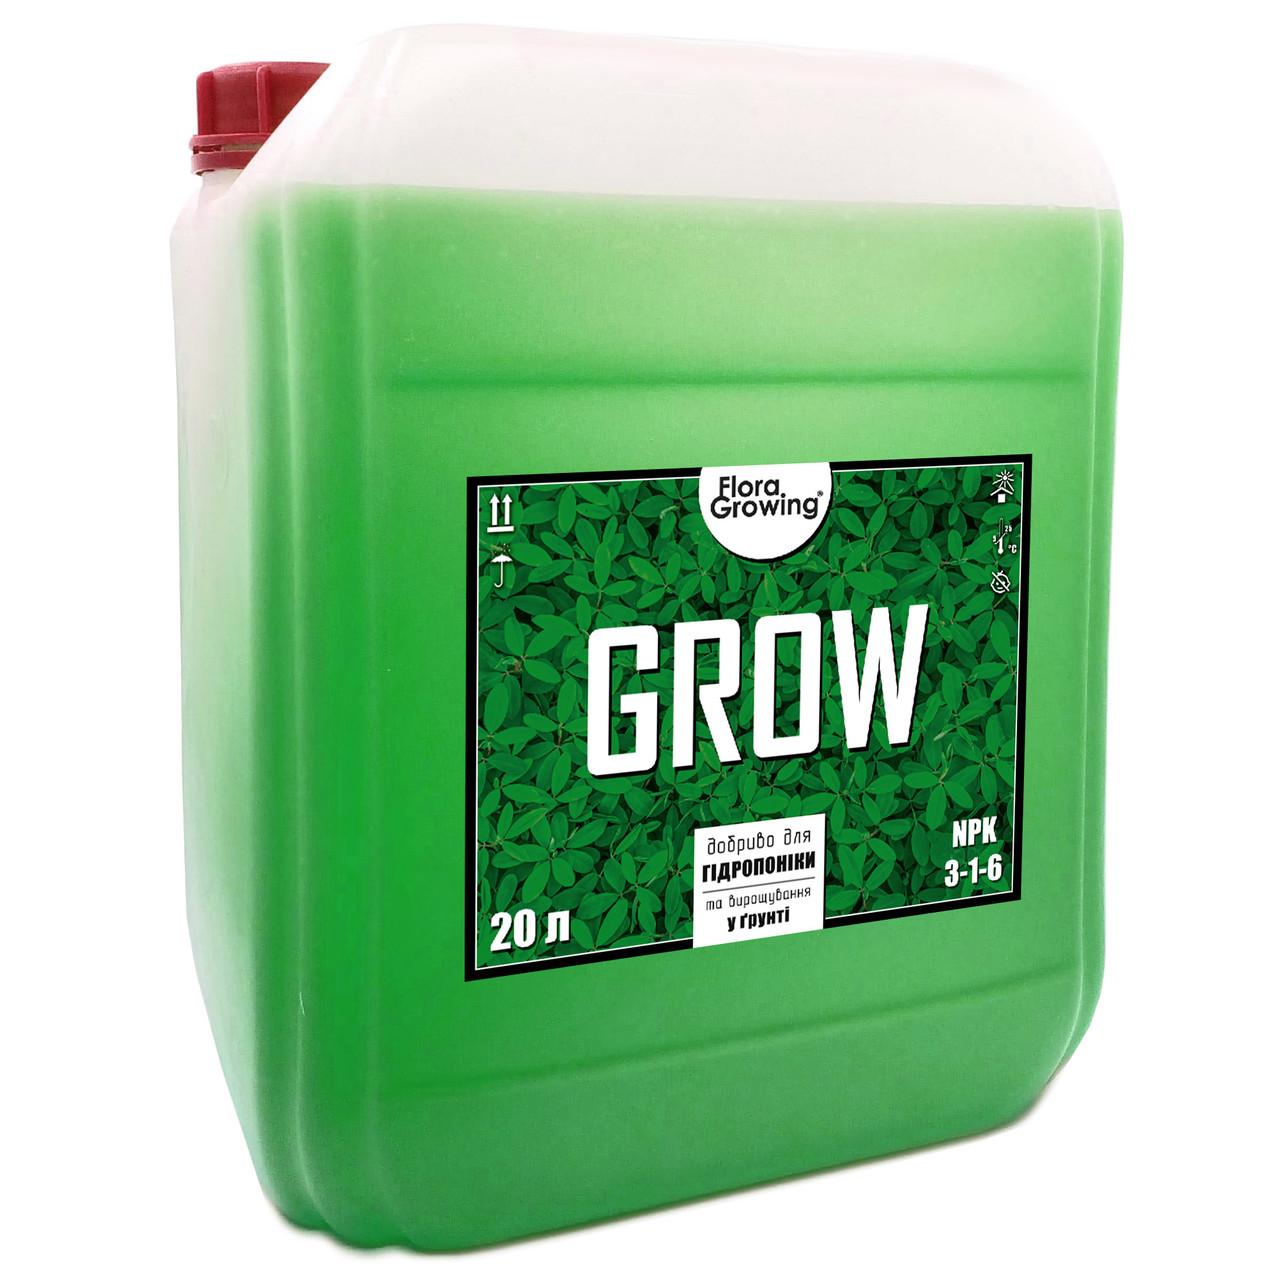 20л Grow - компонент удобрений для гидропоники и почвы аналог GHE